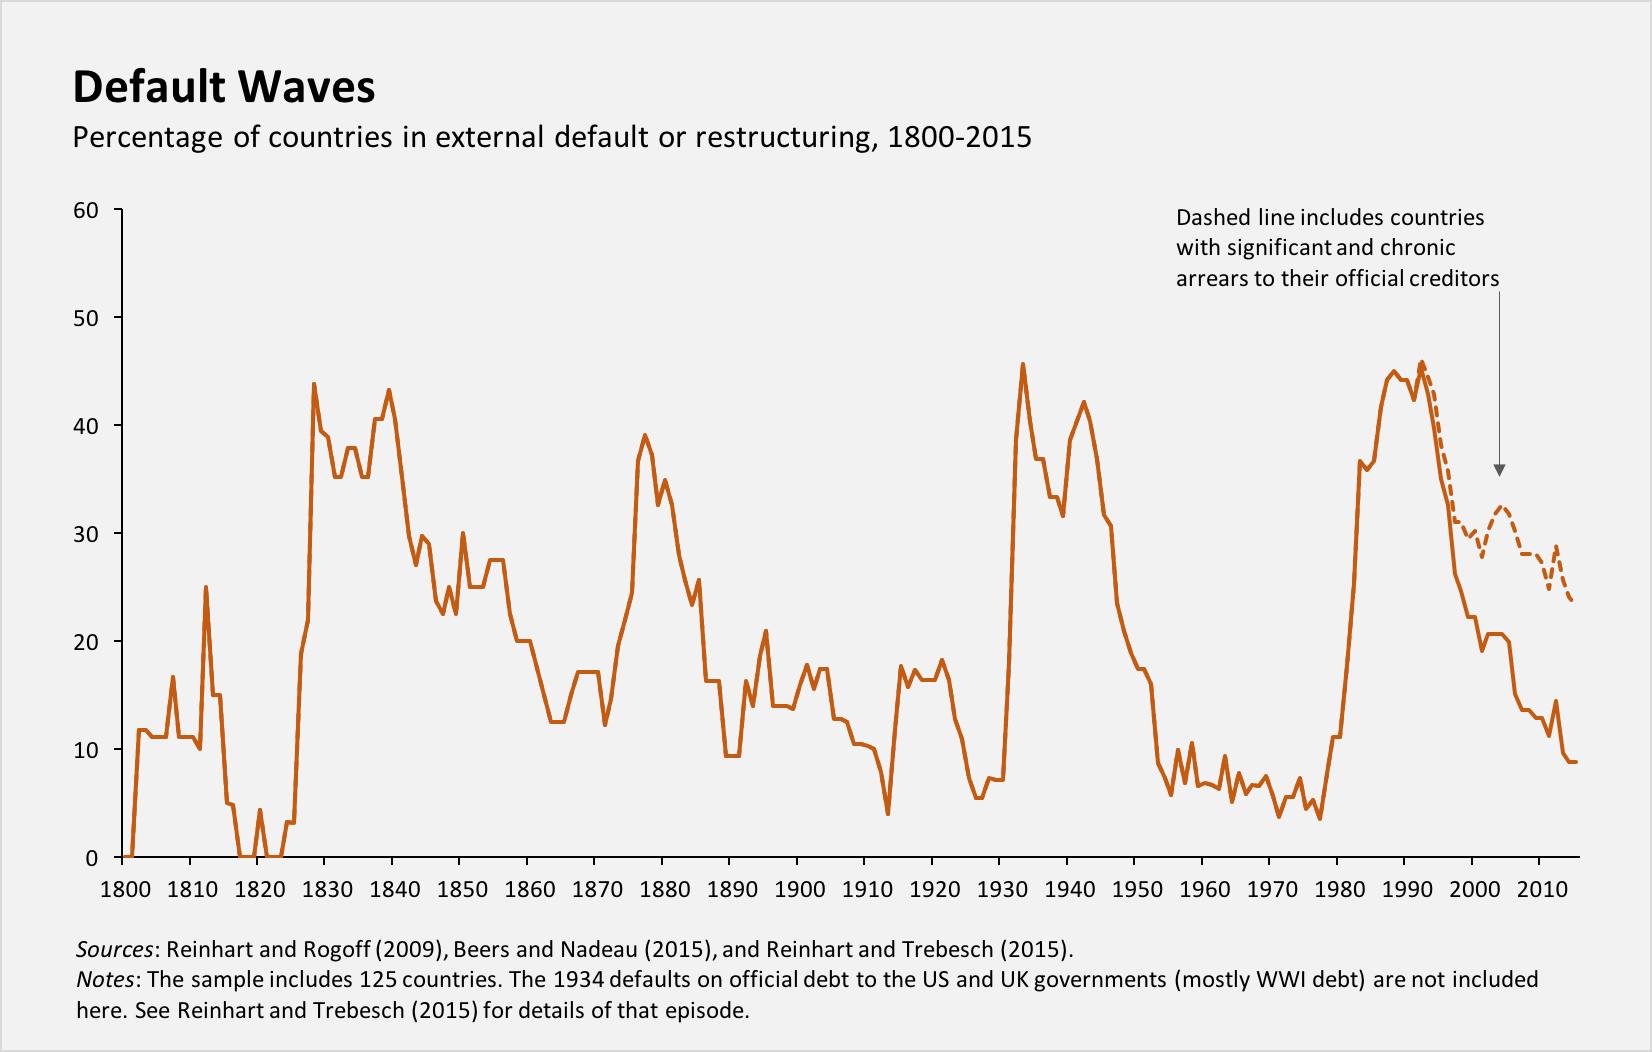 160105-countries default sovereign debt Reinhart and Rogoff